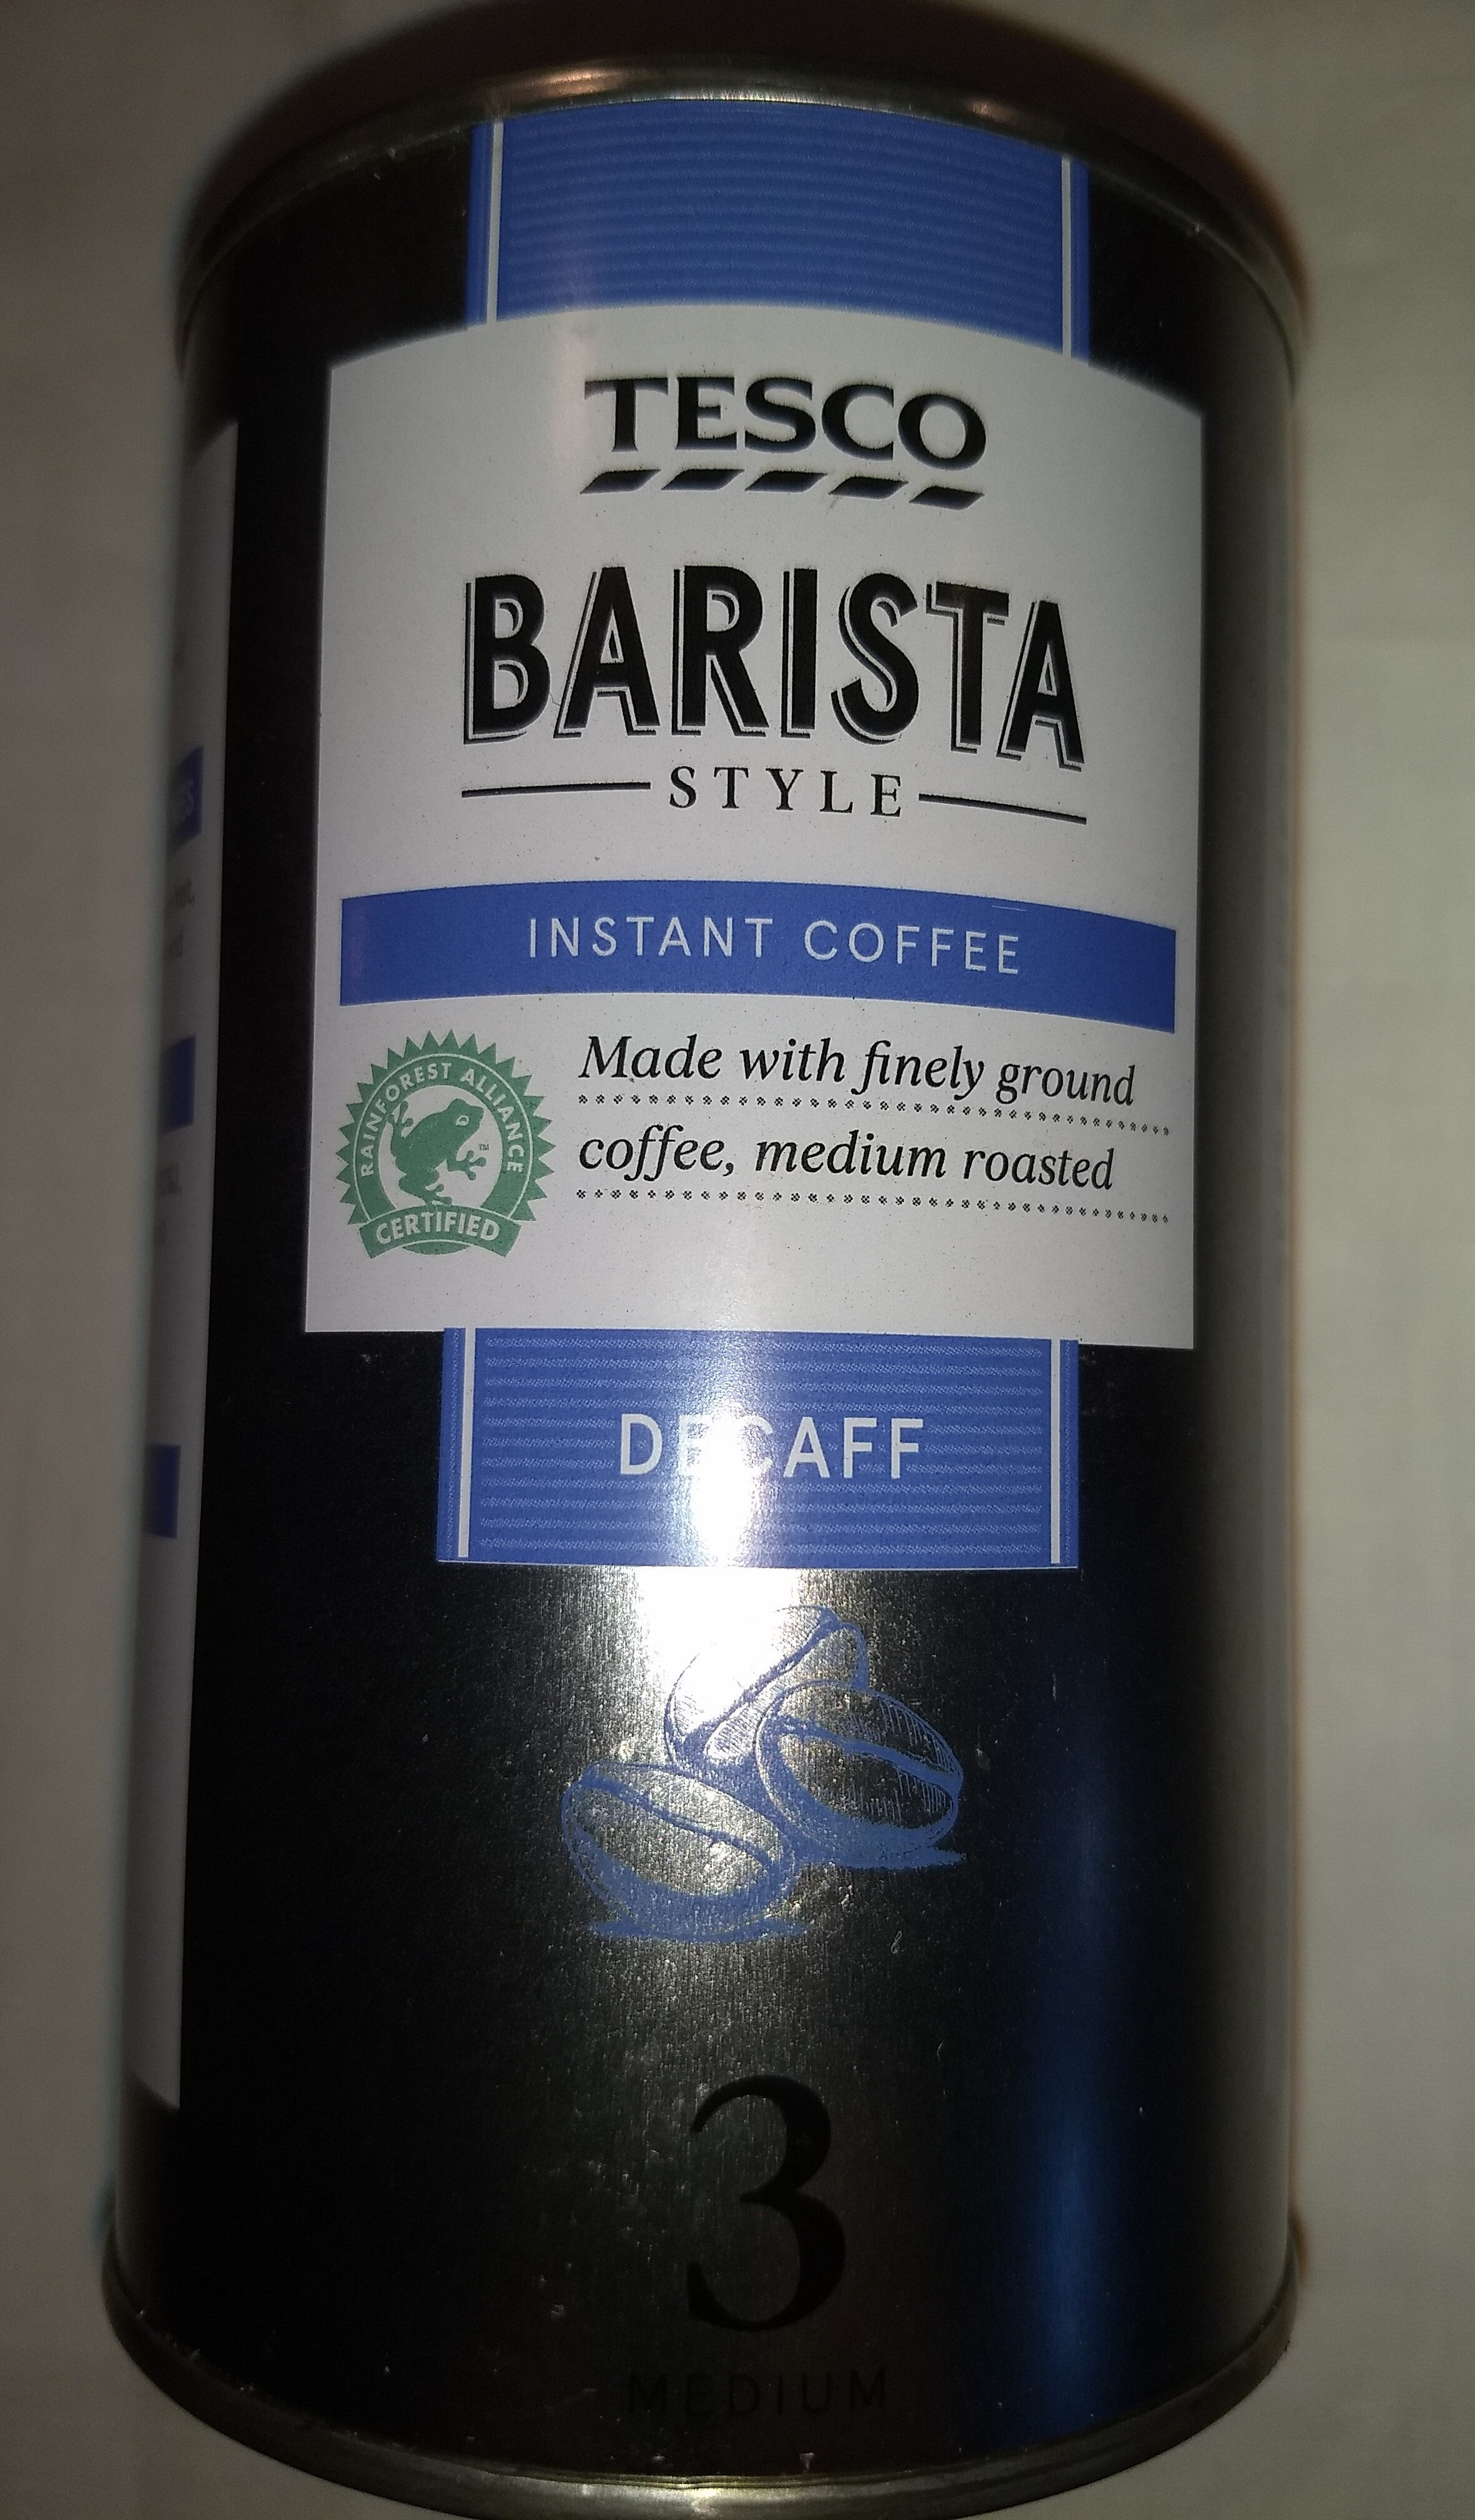 Barista Style Instant Coffee Tesco 100g